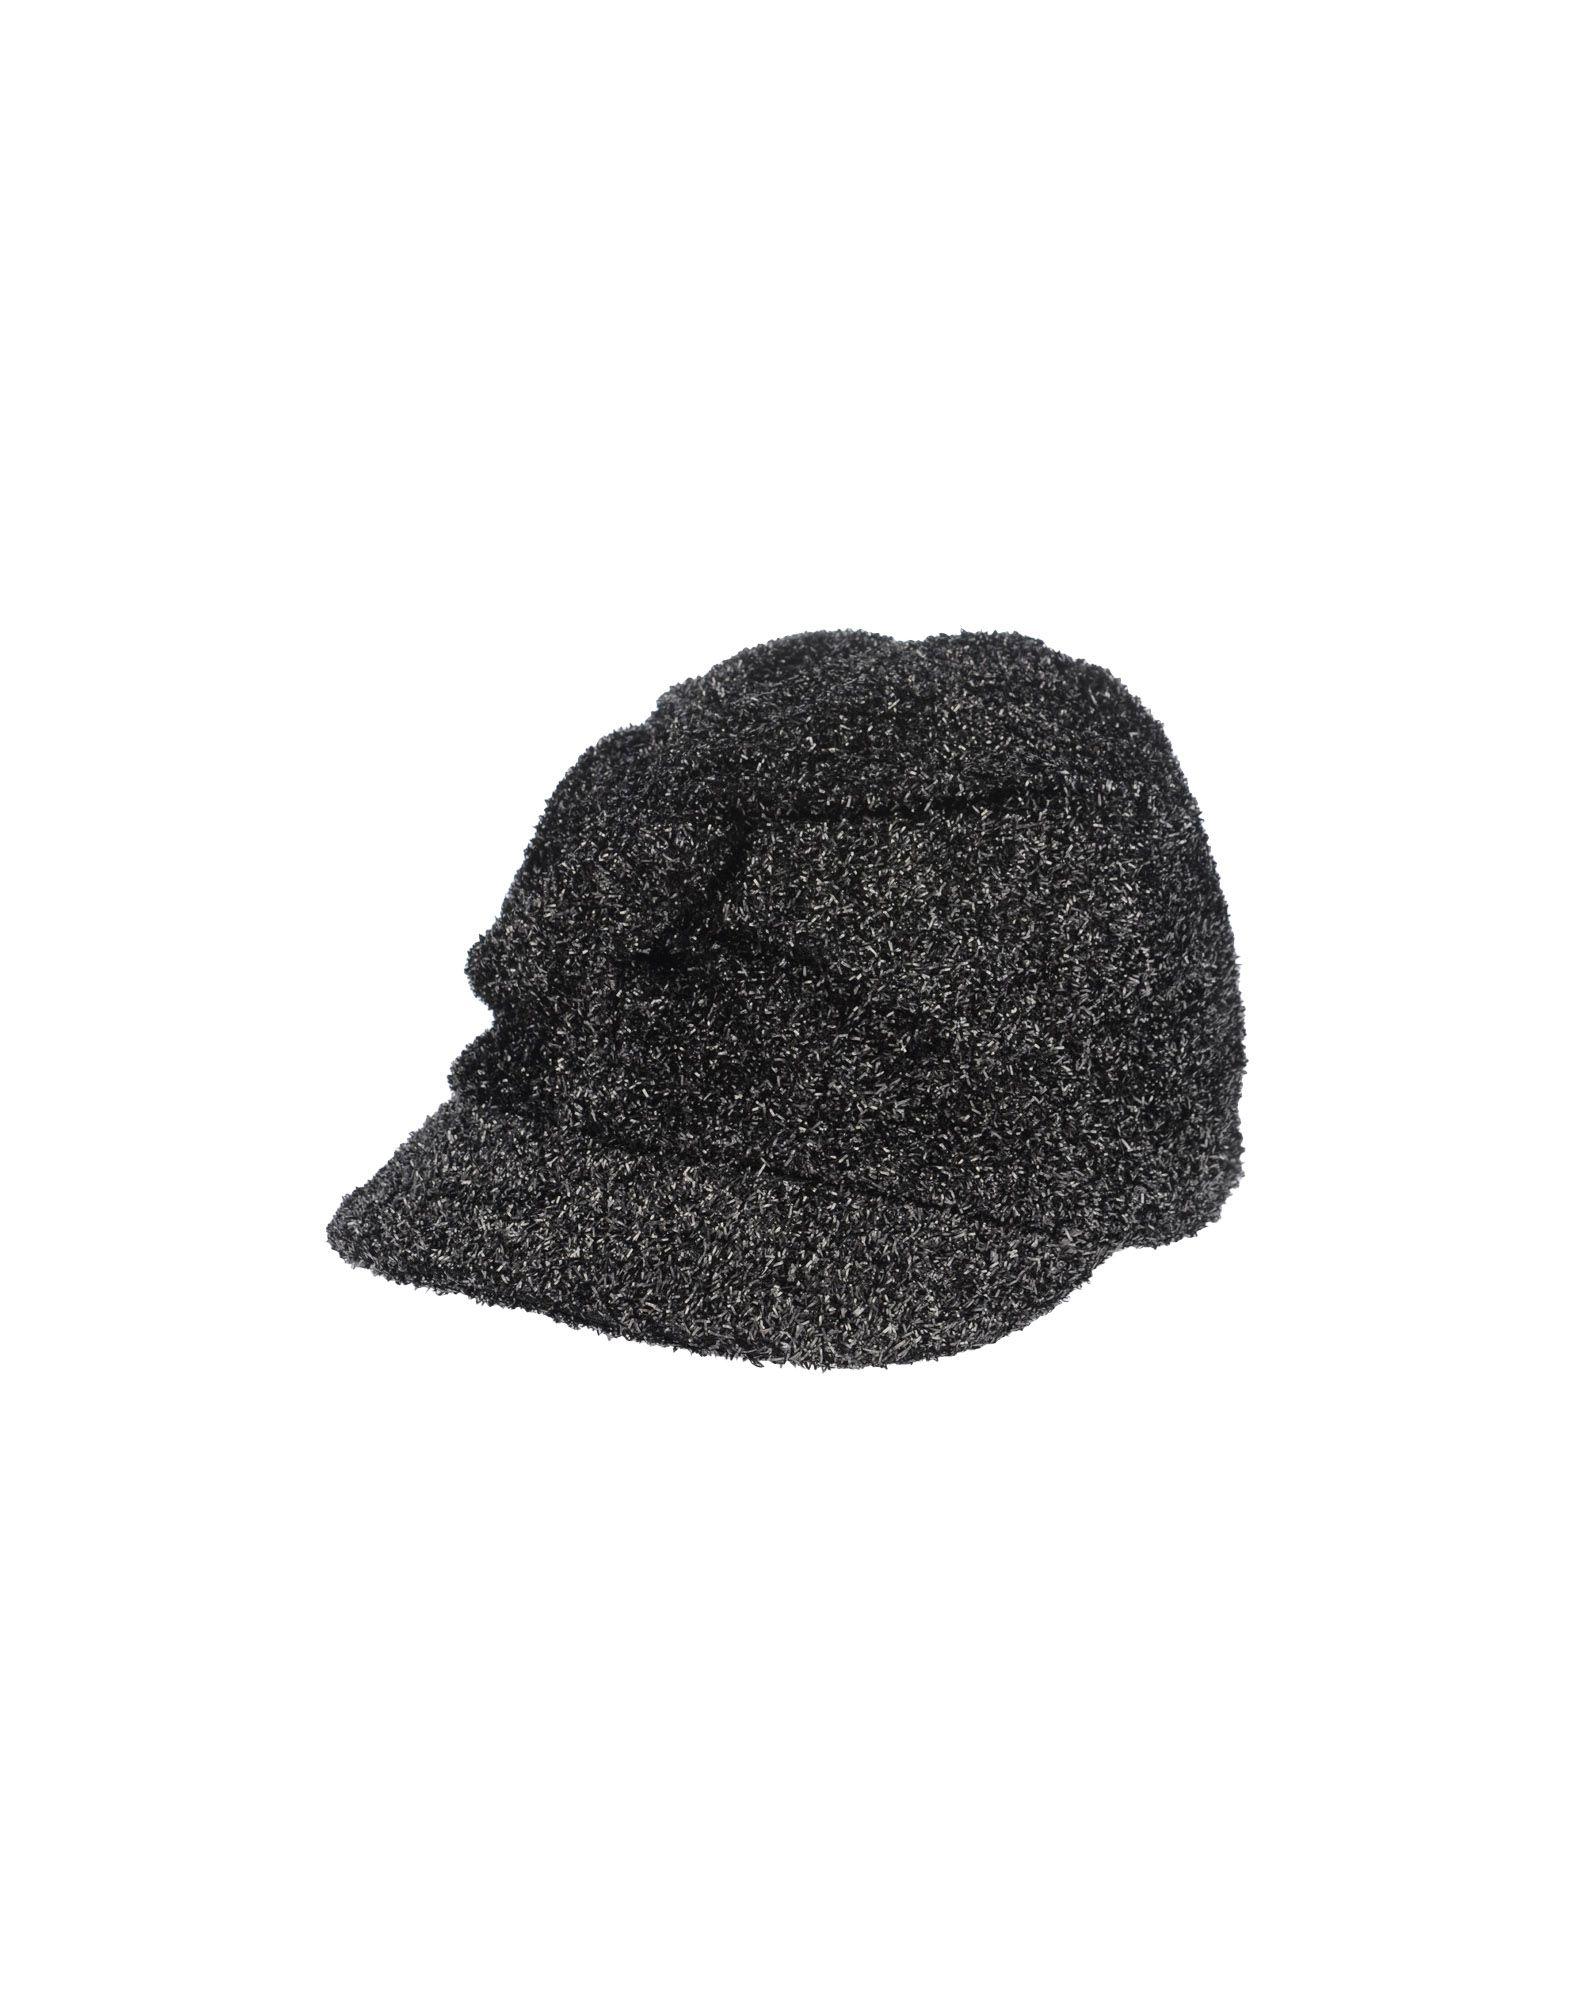 SUPER DUPER HATS Hat in Steel Grey